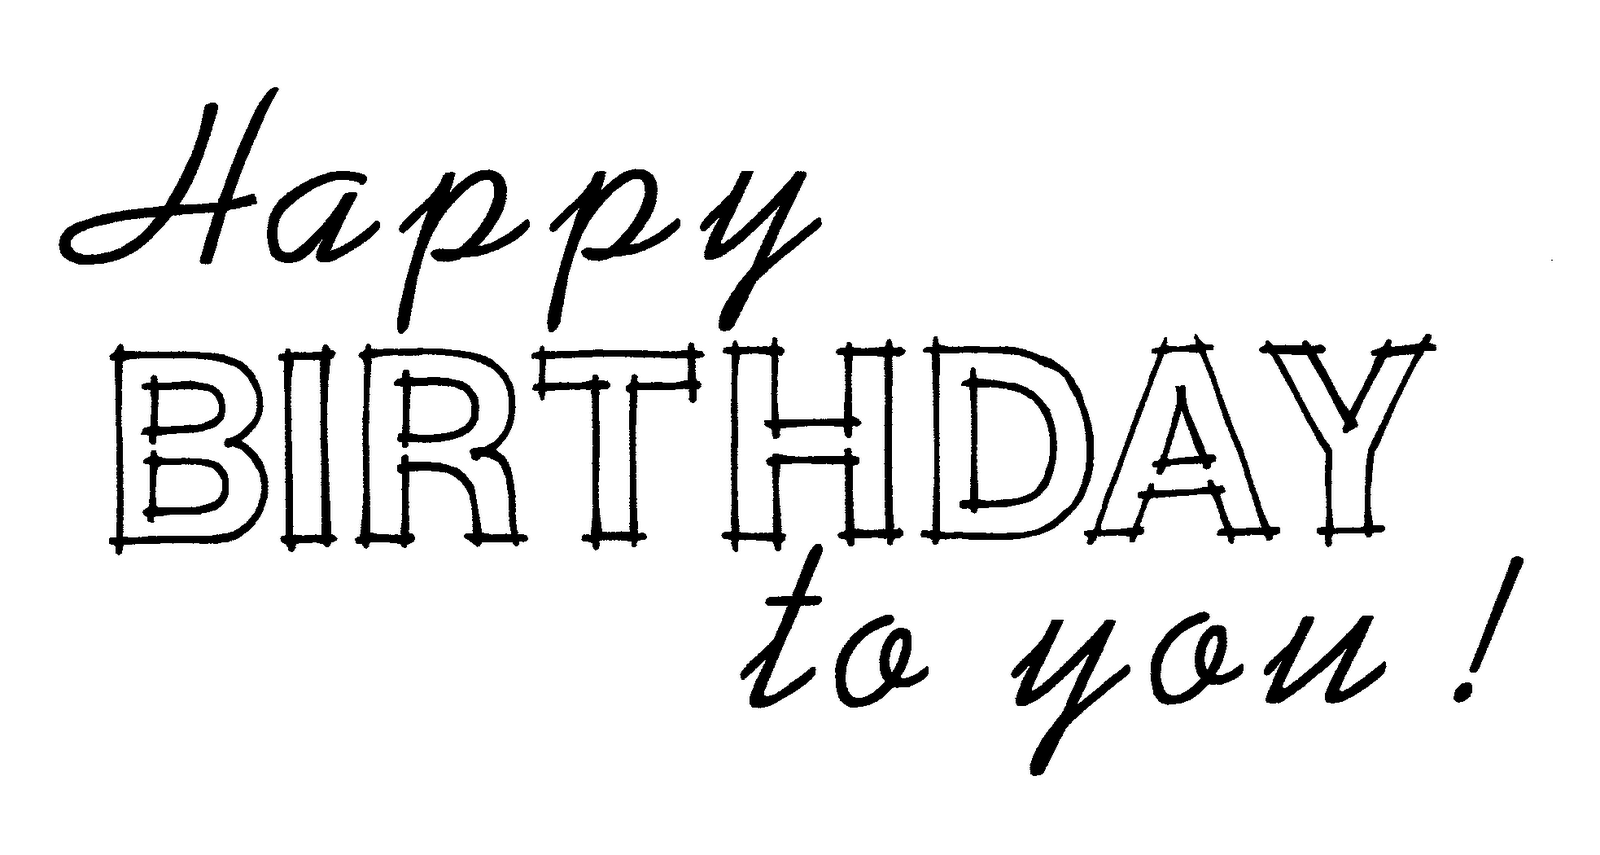 Desert Diva Happy Birthday To You